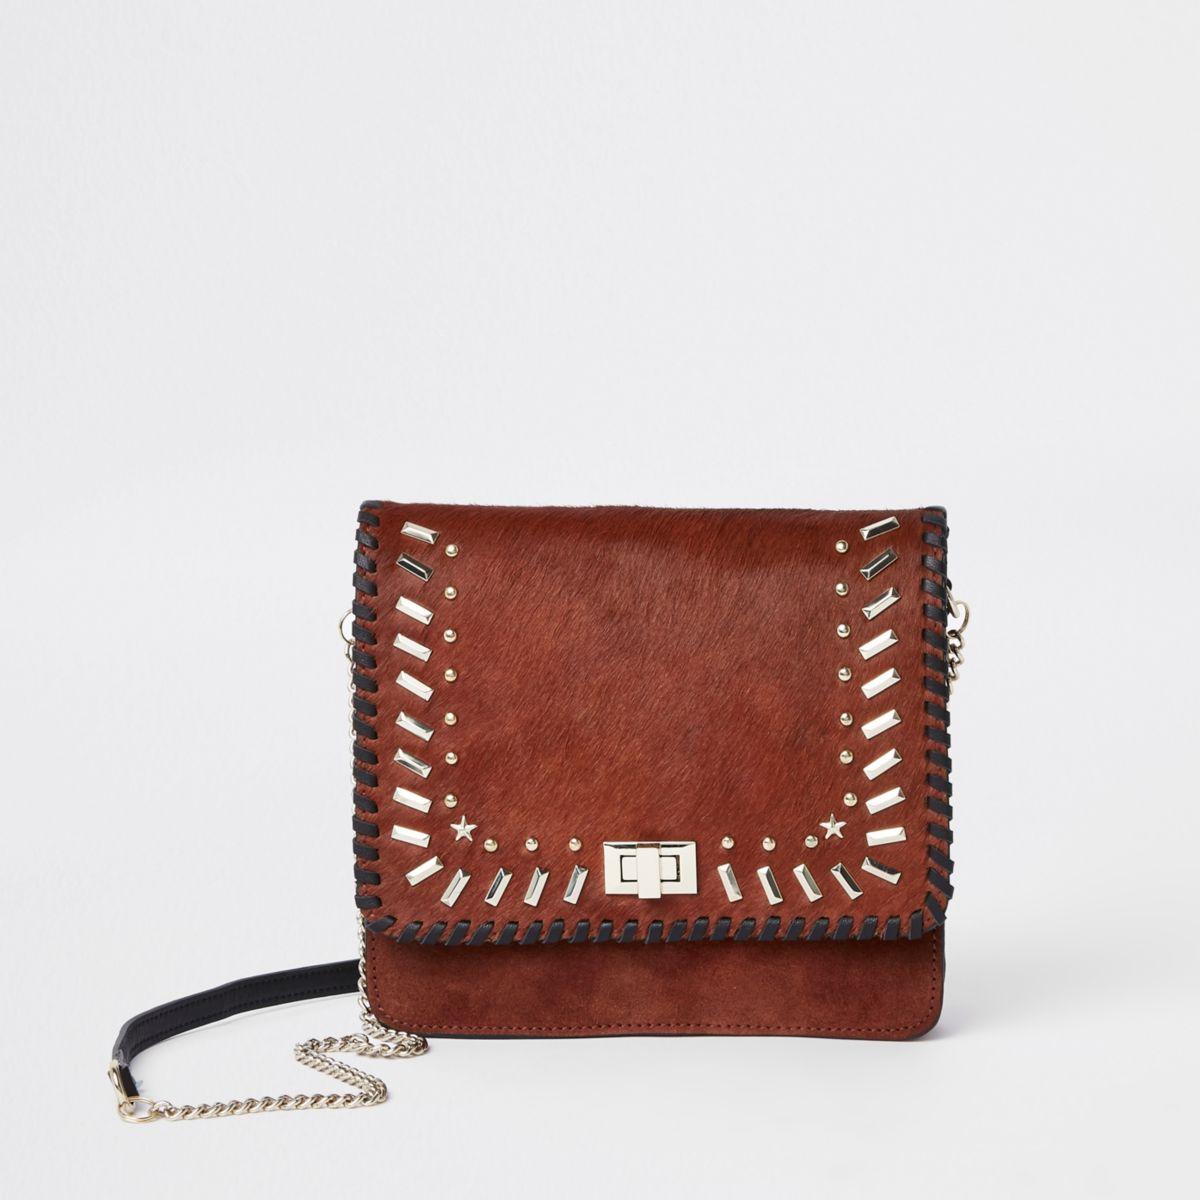 Dark red leather studded cross body bag